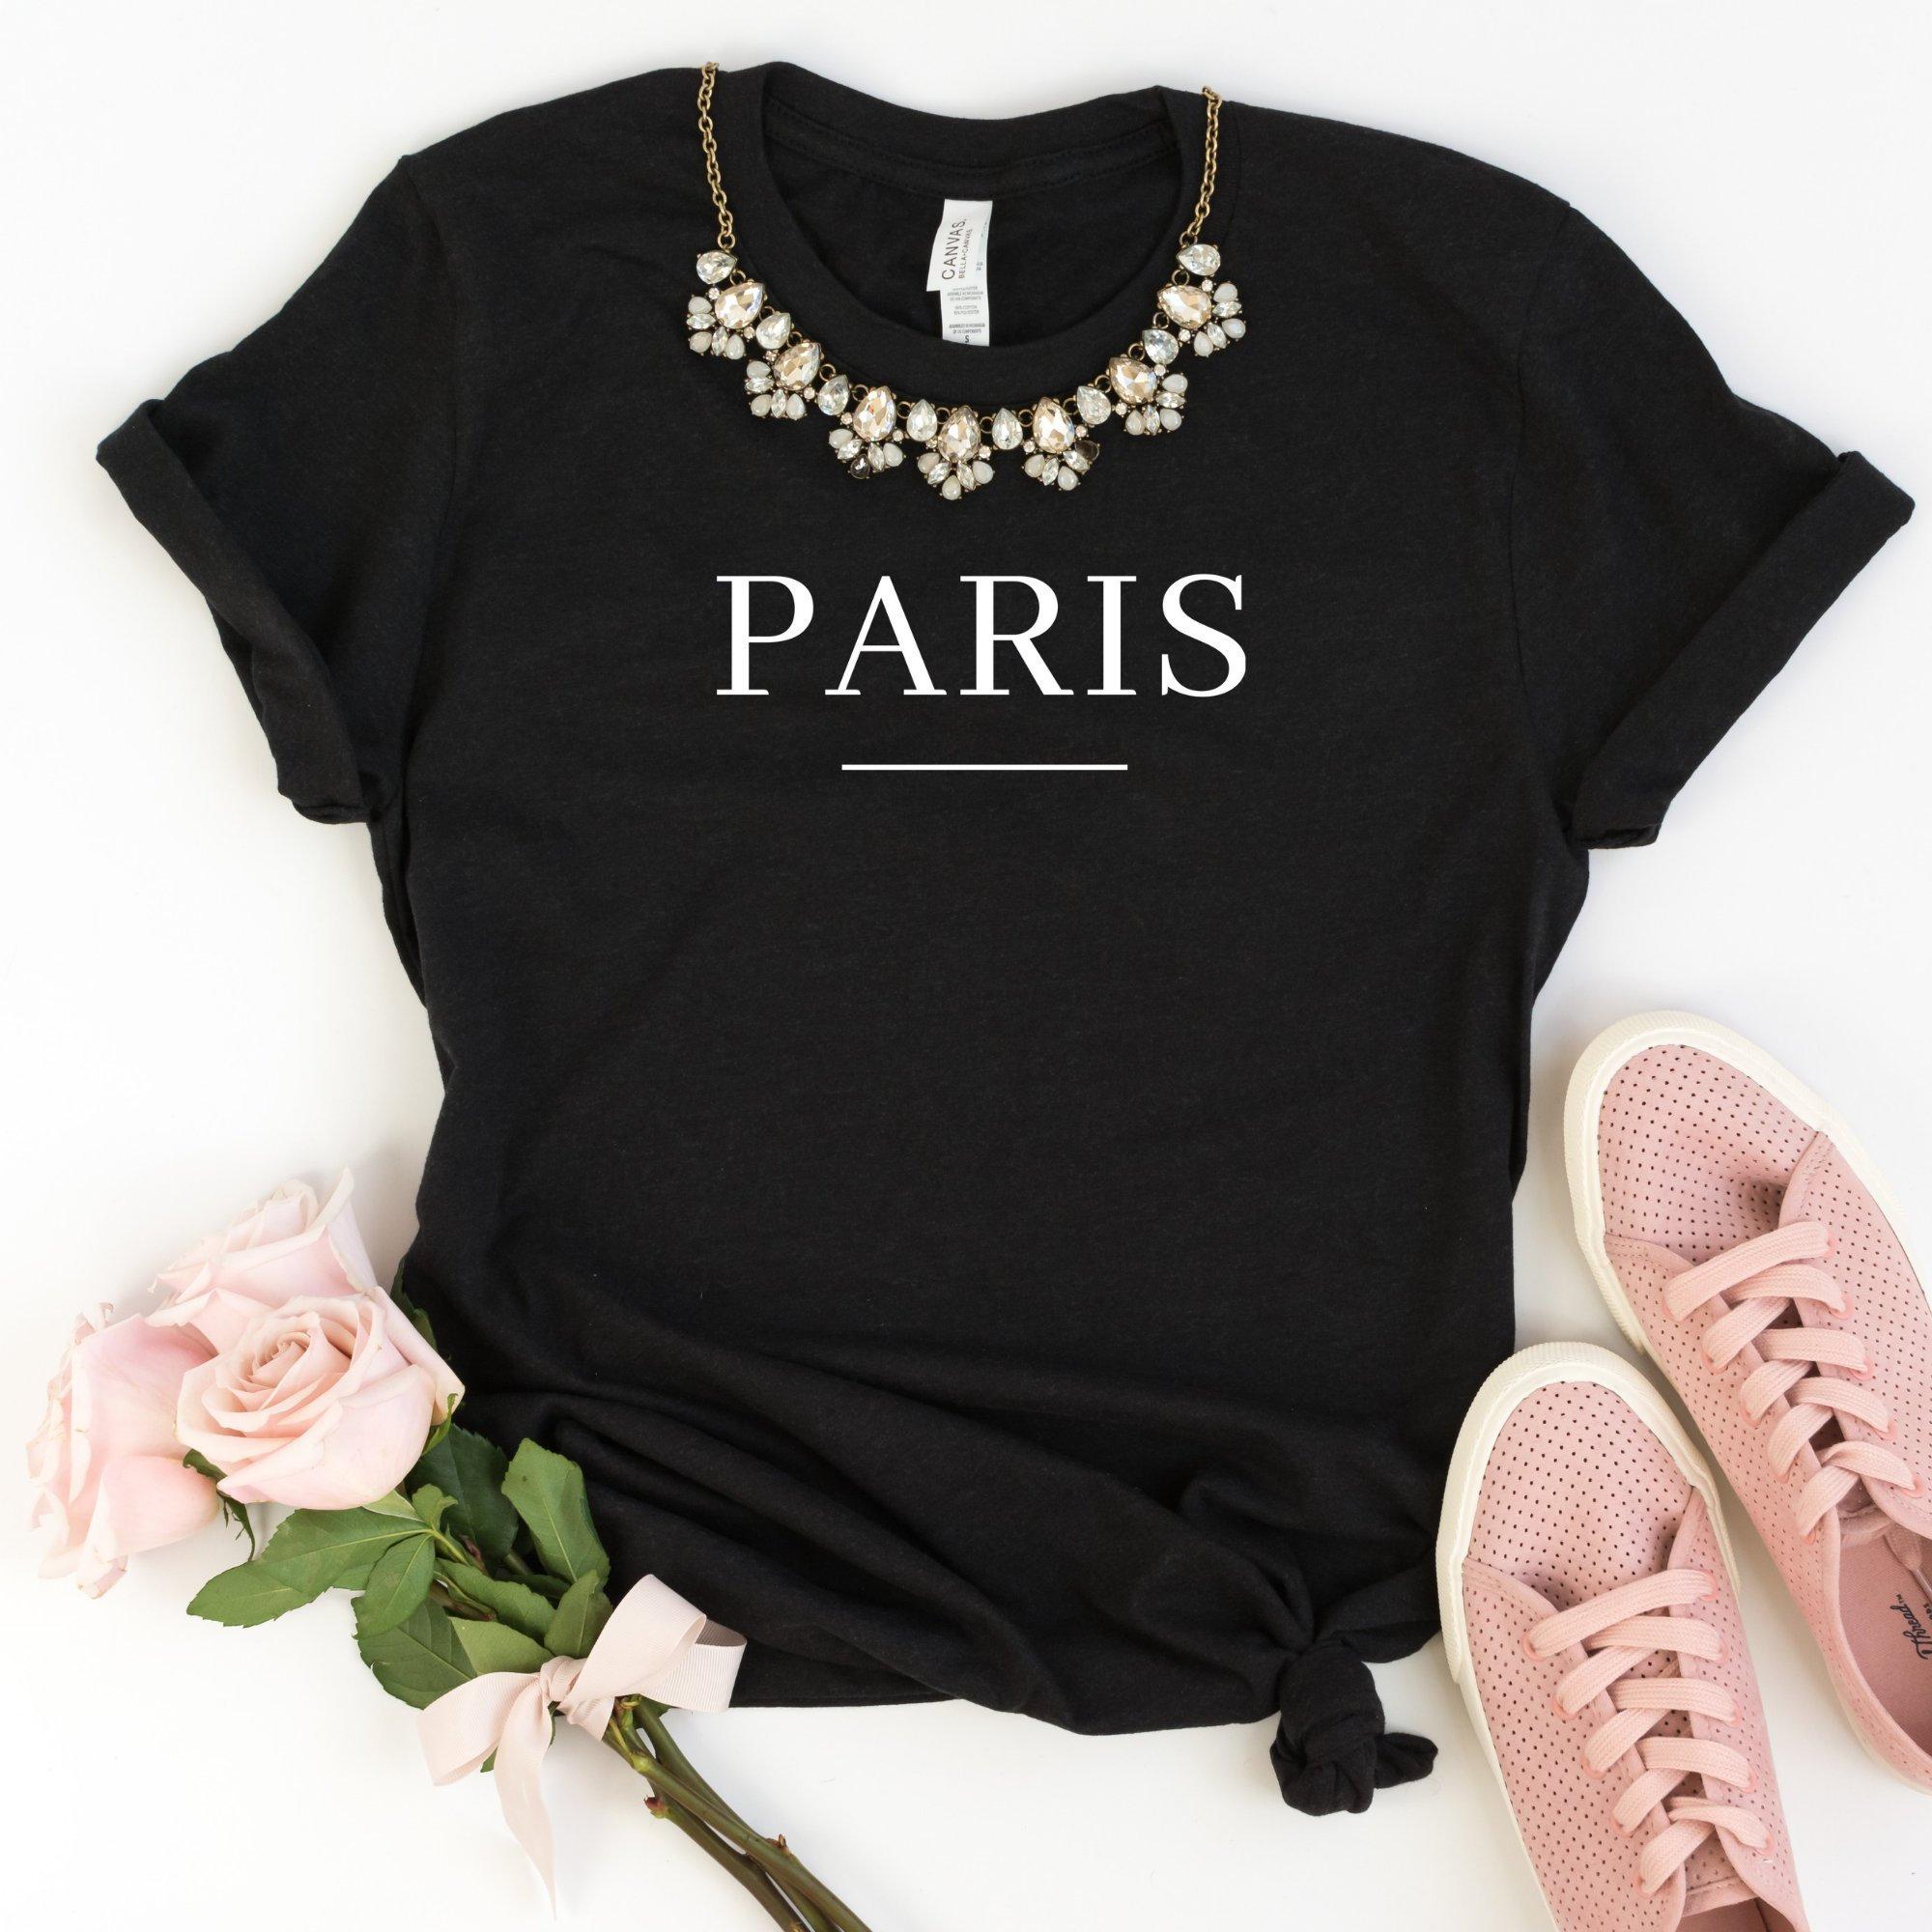 Paris Women Tshirt Casual Cotton Hipster Funny T-shirt For Lady Yong Girl Top Tee Drop Ship ZY-223